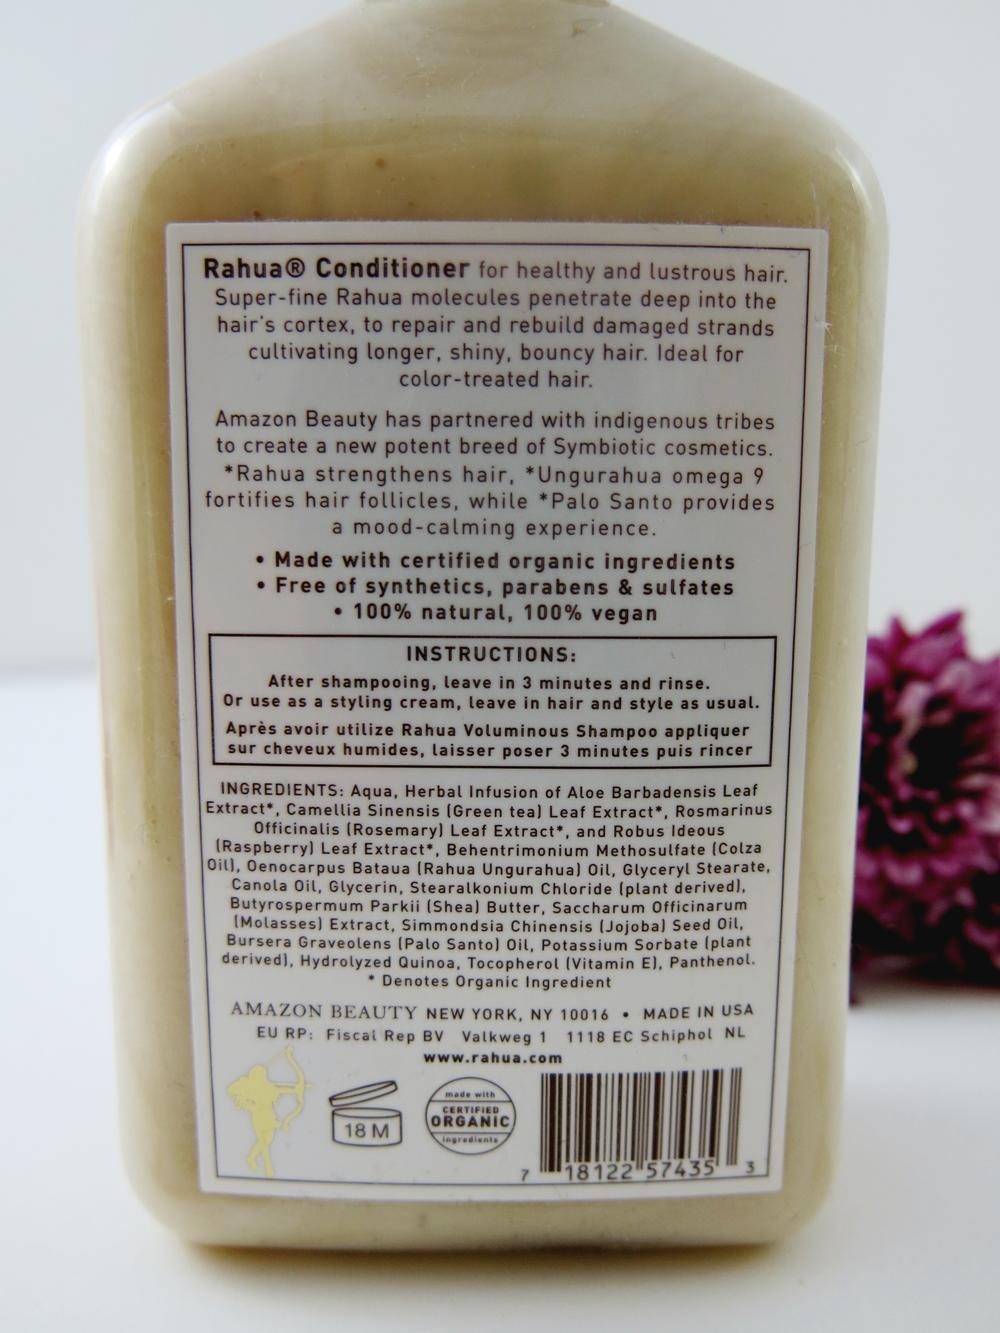 Rahua Voluminous Shampoo and Conditioner Review Rahua